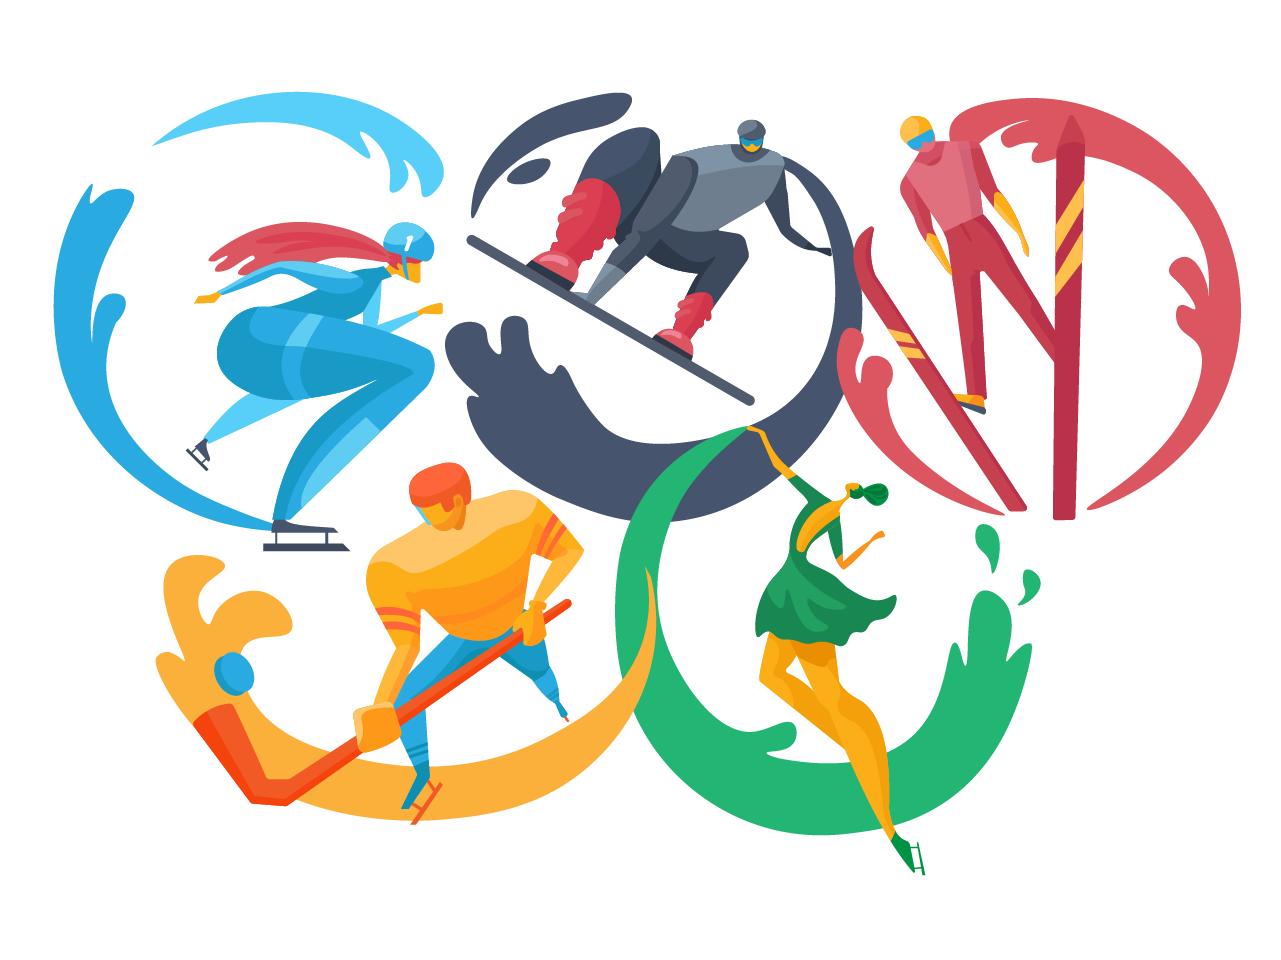 olimpic games illustration 3